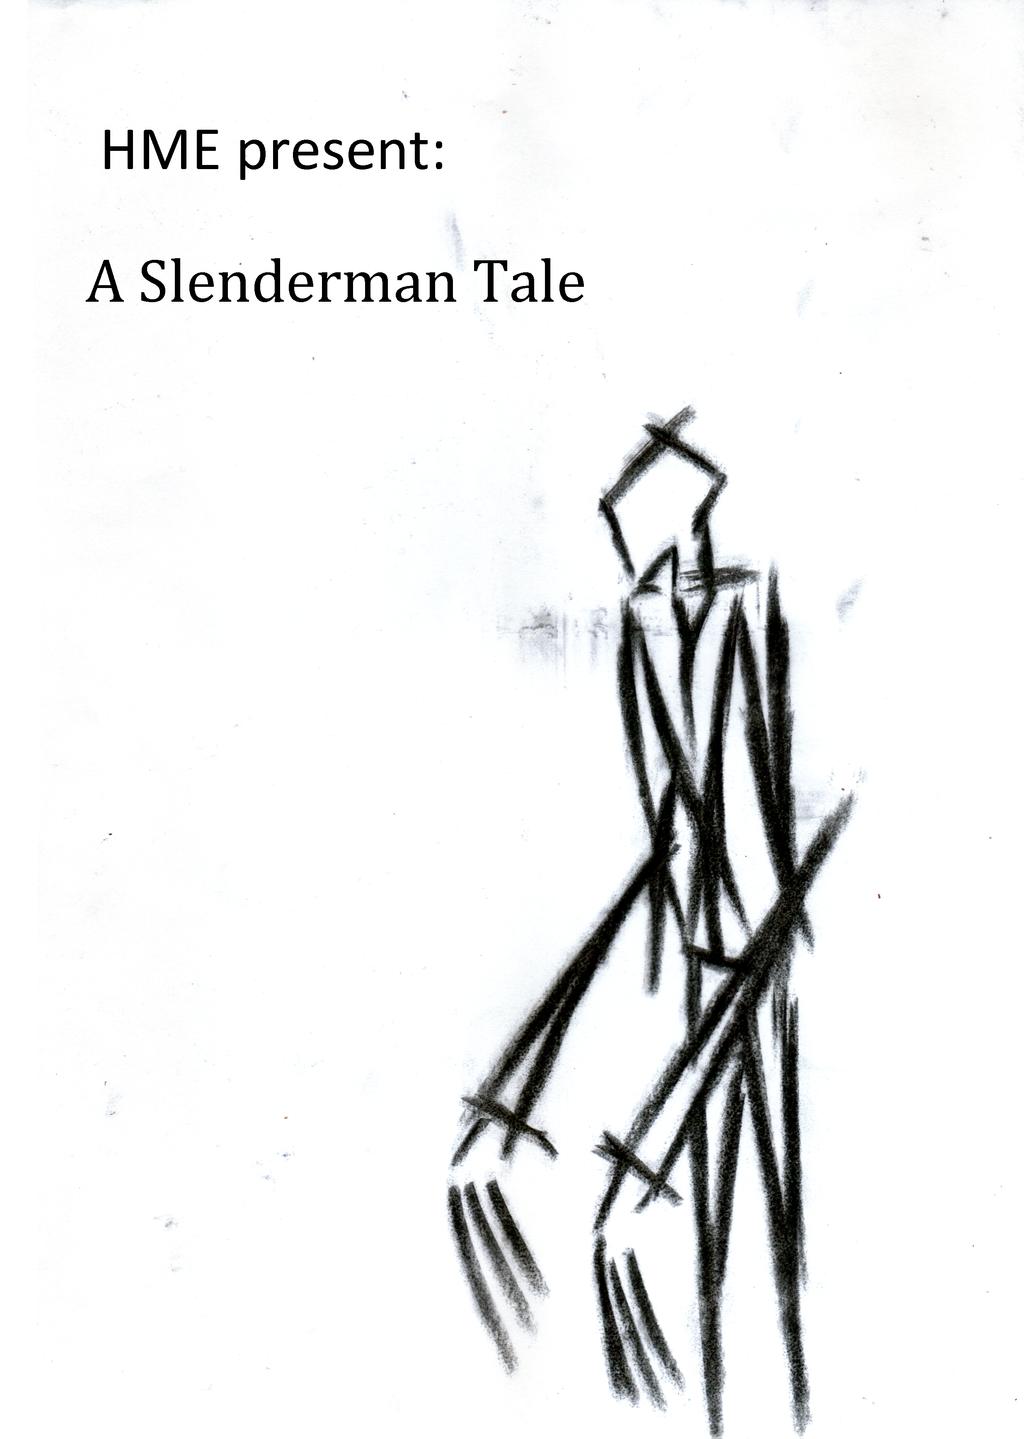 A Slenderman Tale by H-M-E